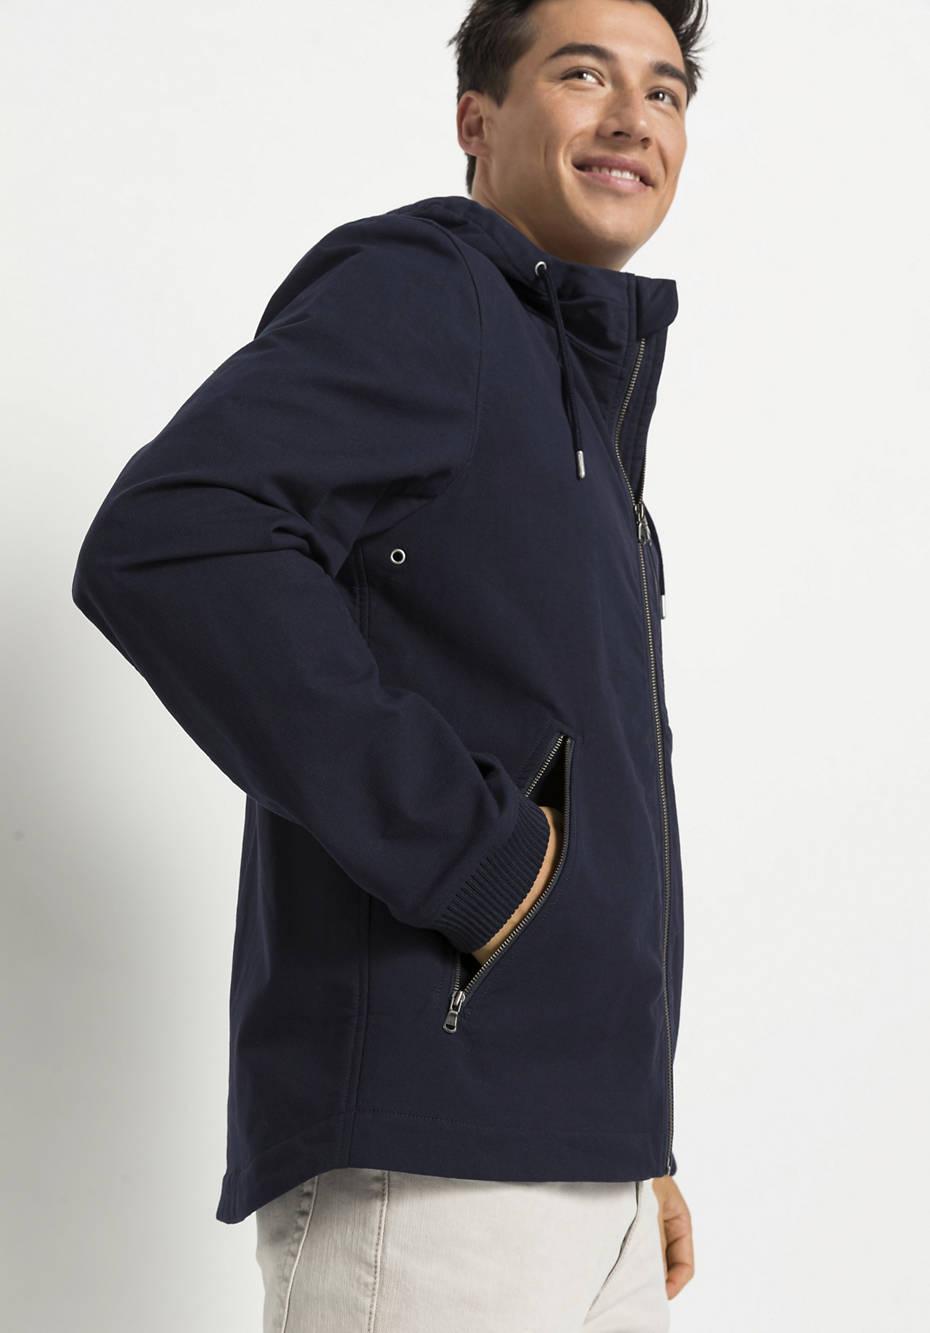 Softshell field jacket made of organic cotton